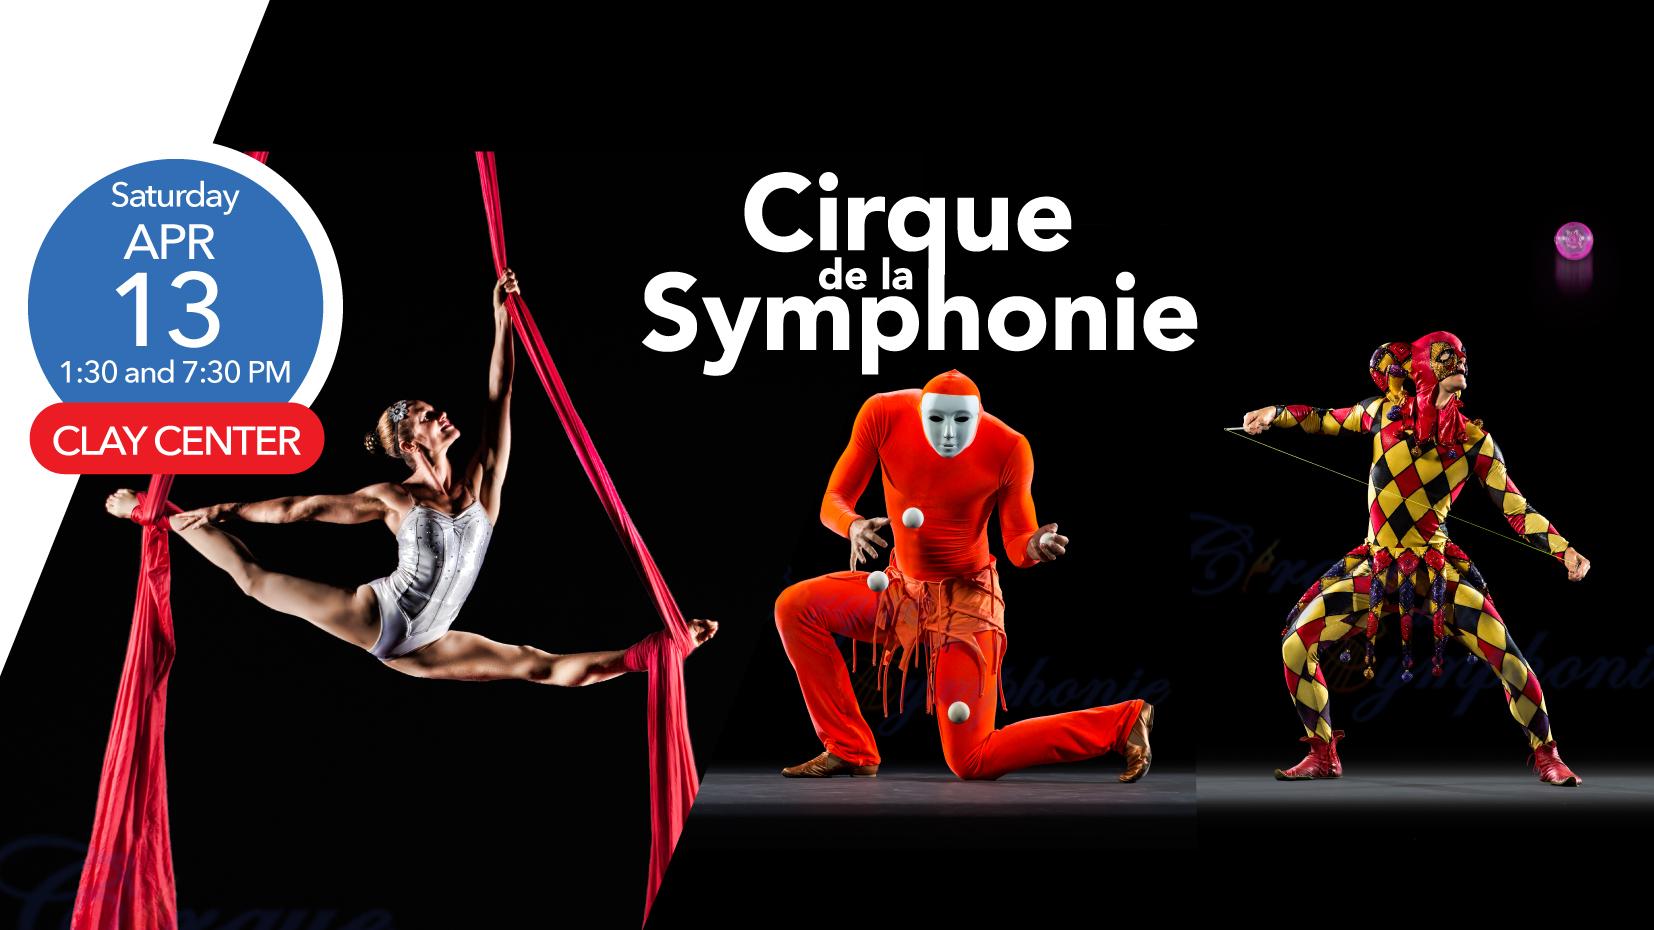 WVSO_2018_2019_Cirque_FB_Date.jpg